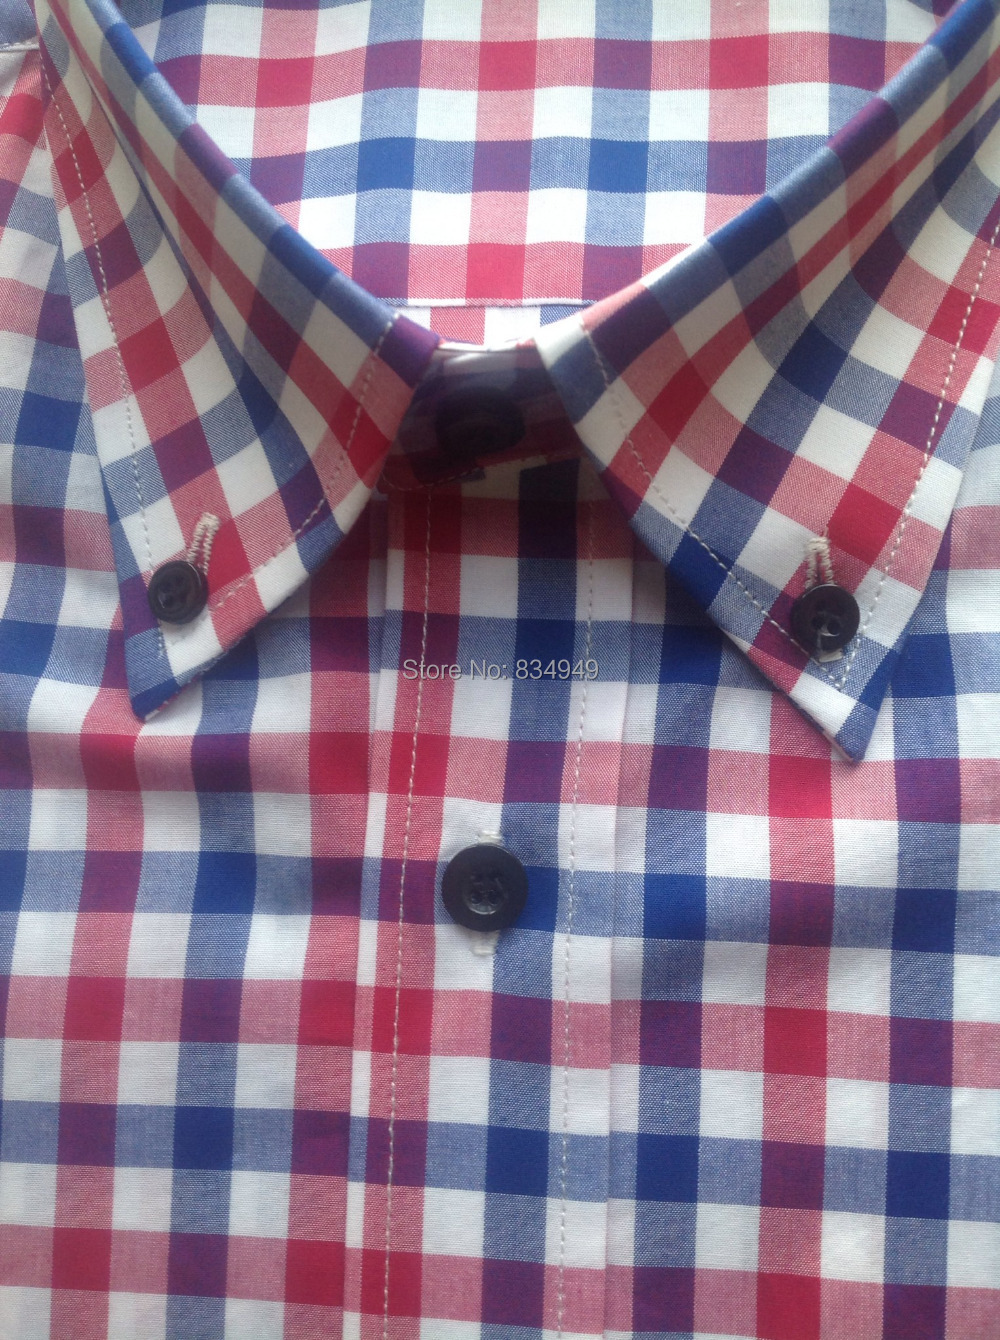 Online Get Cheap Men Custom Shirts -Aliexpress.com | Alibaba Group